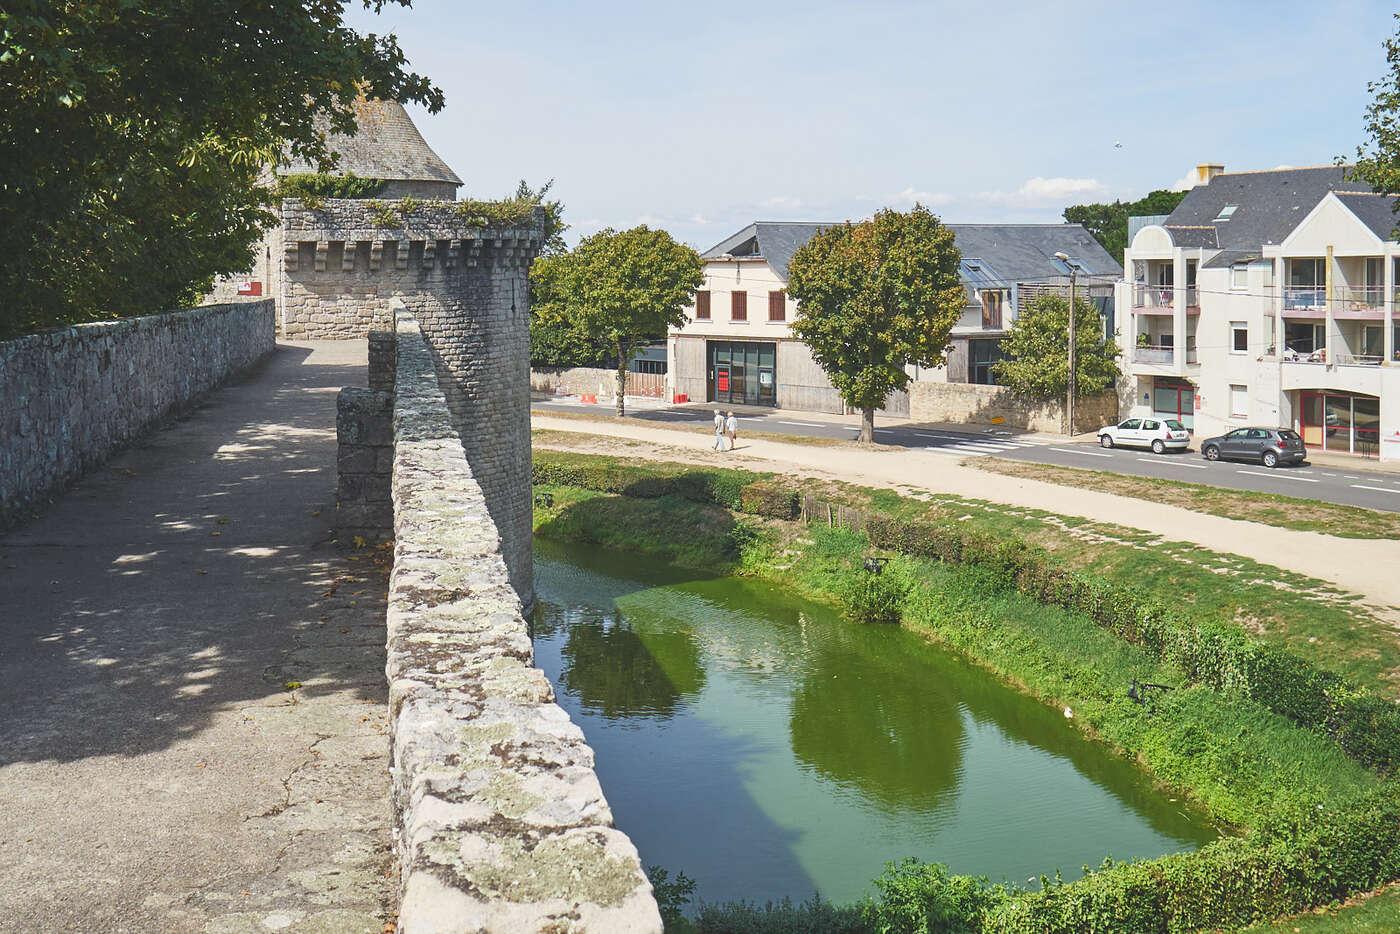 Tourelle de la mutaille de Guérande